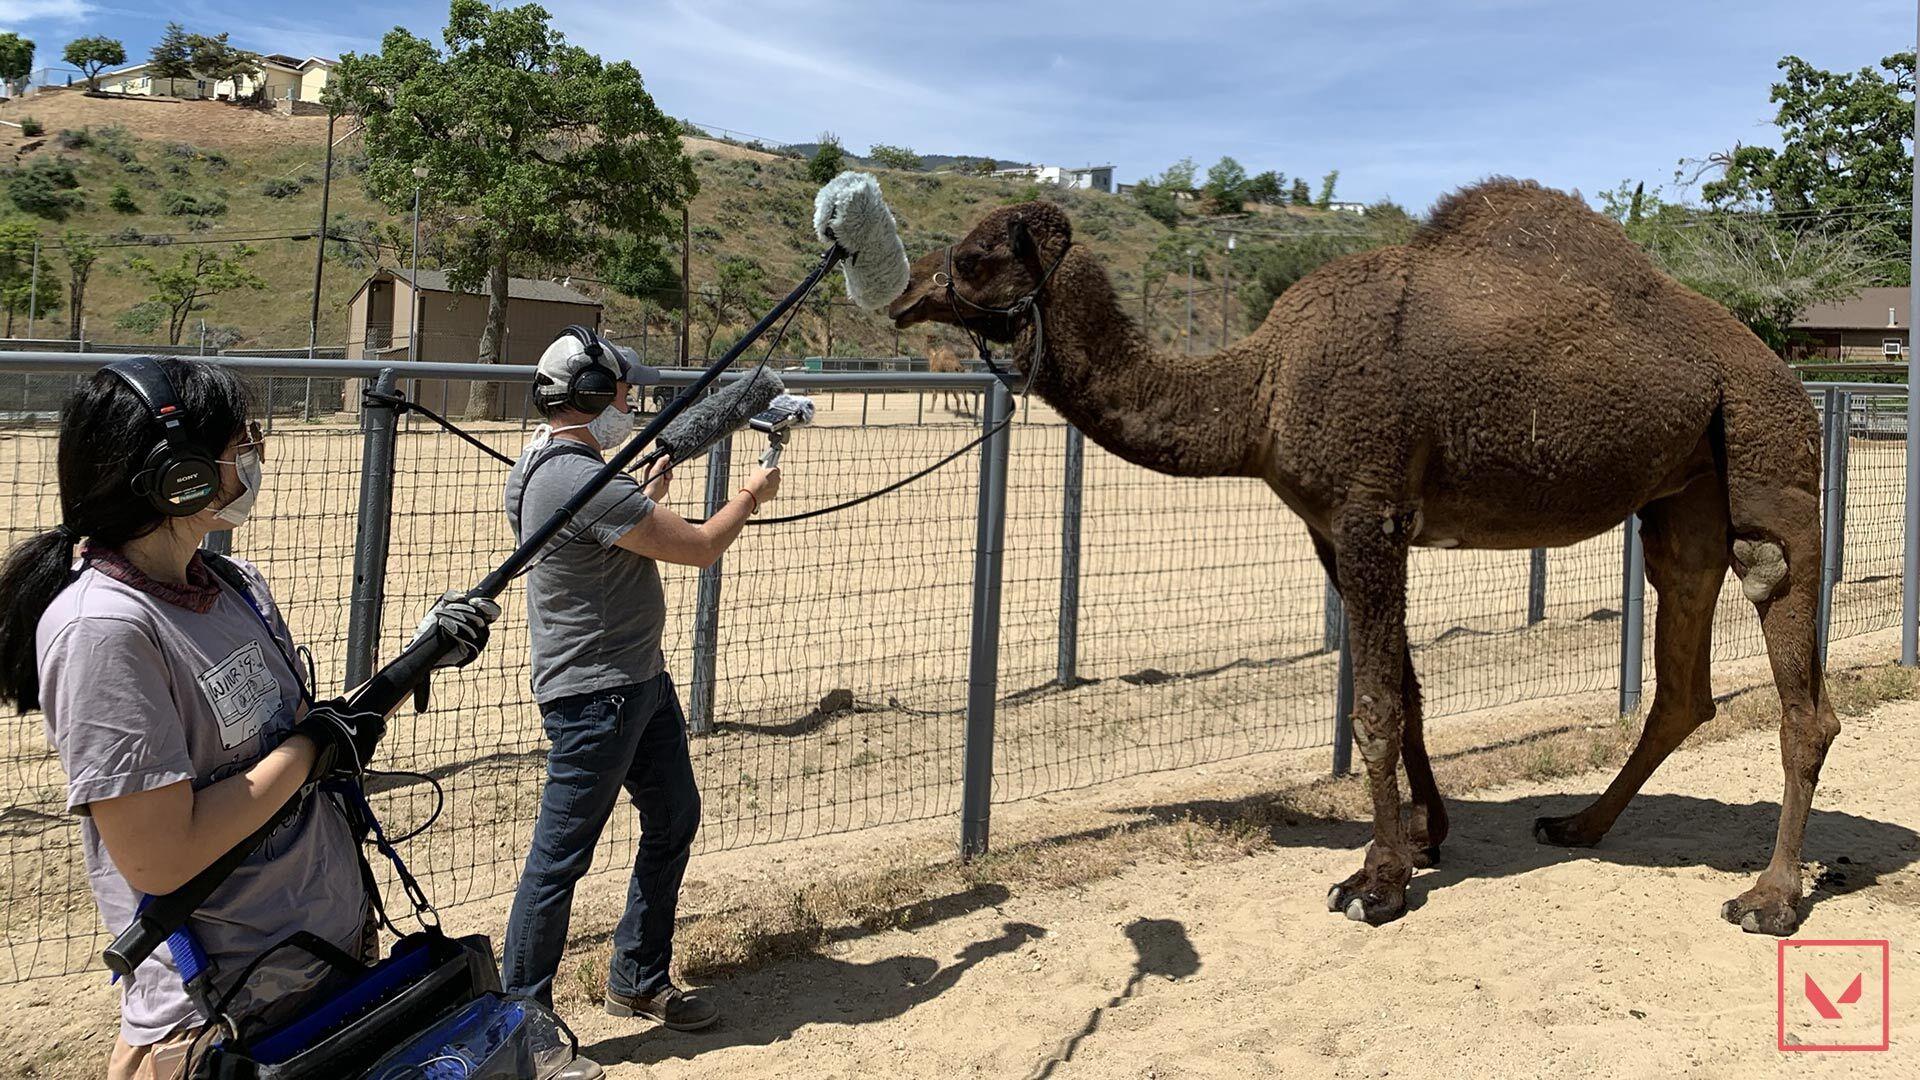 Updated_Camel_004.jpg